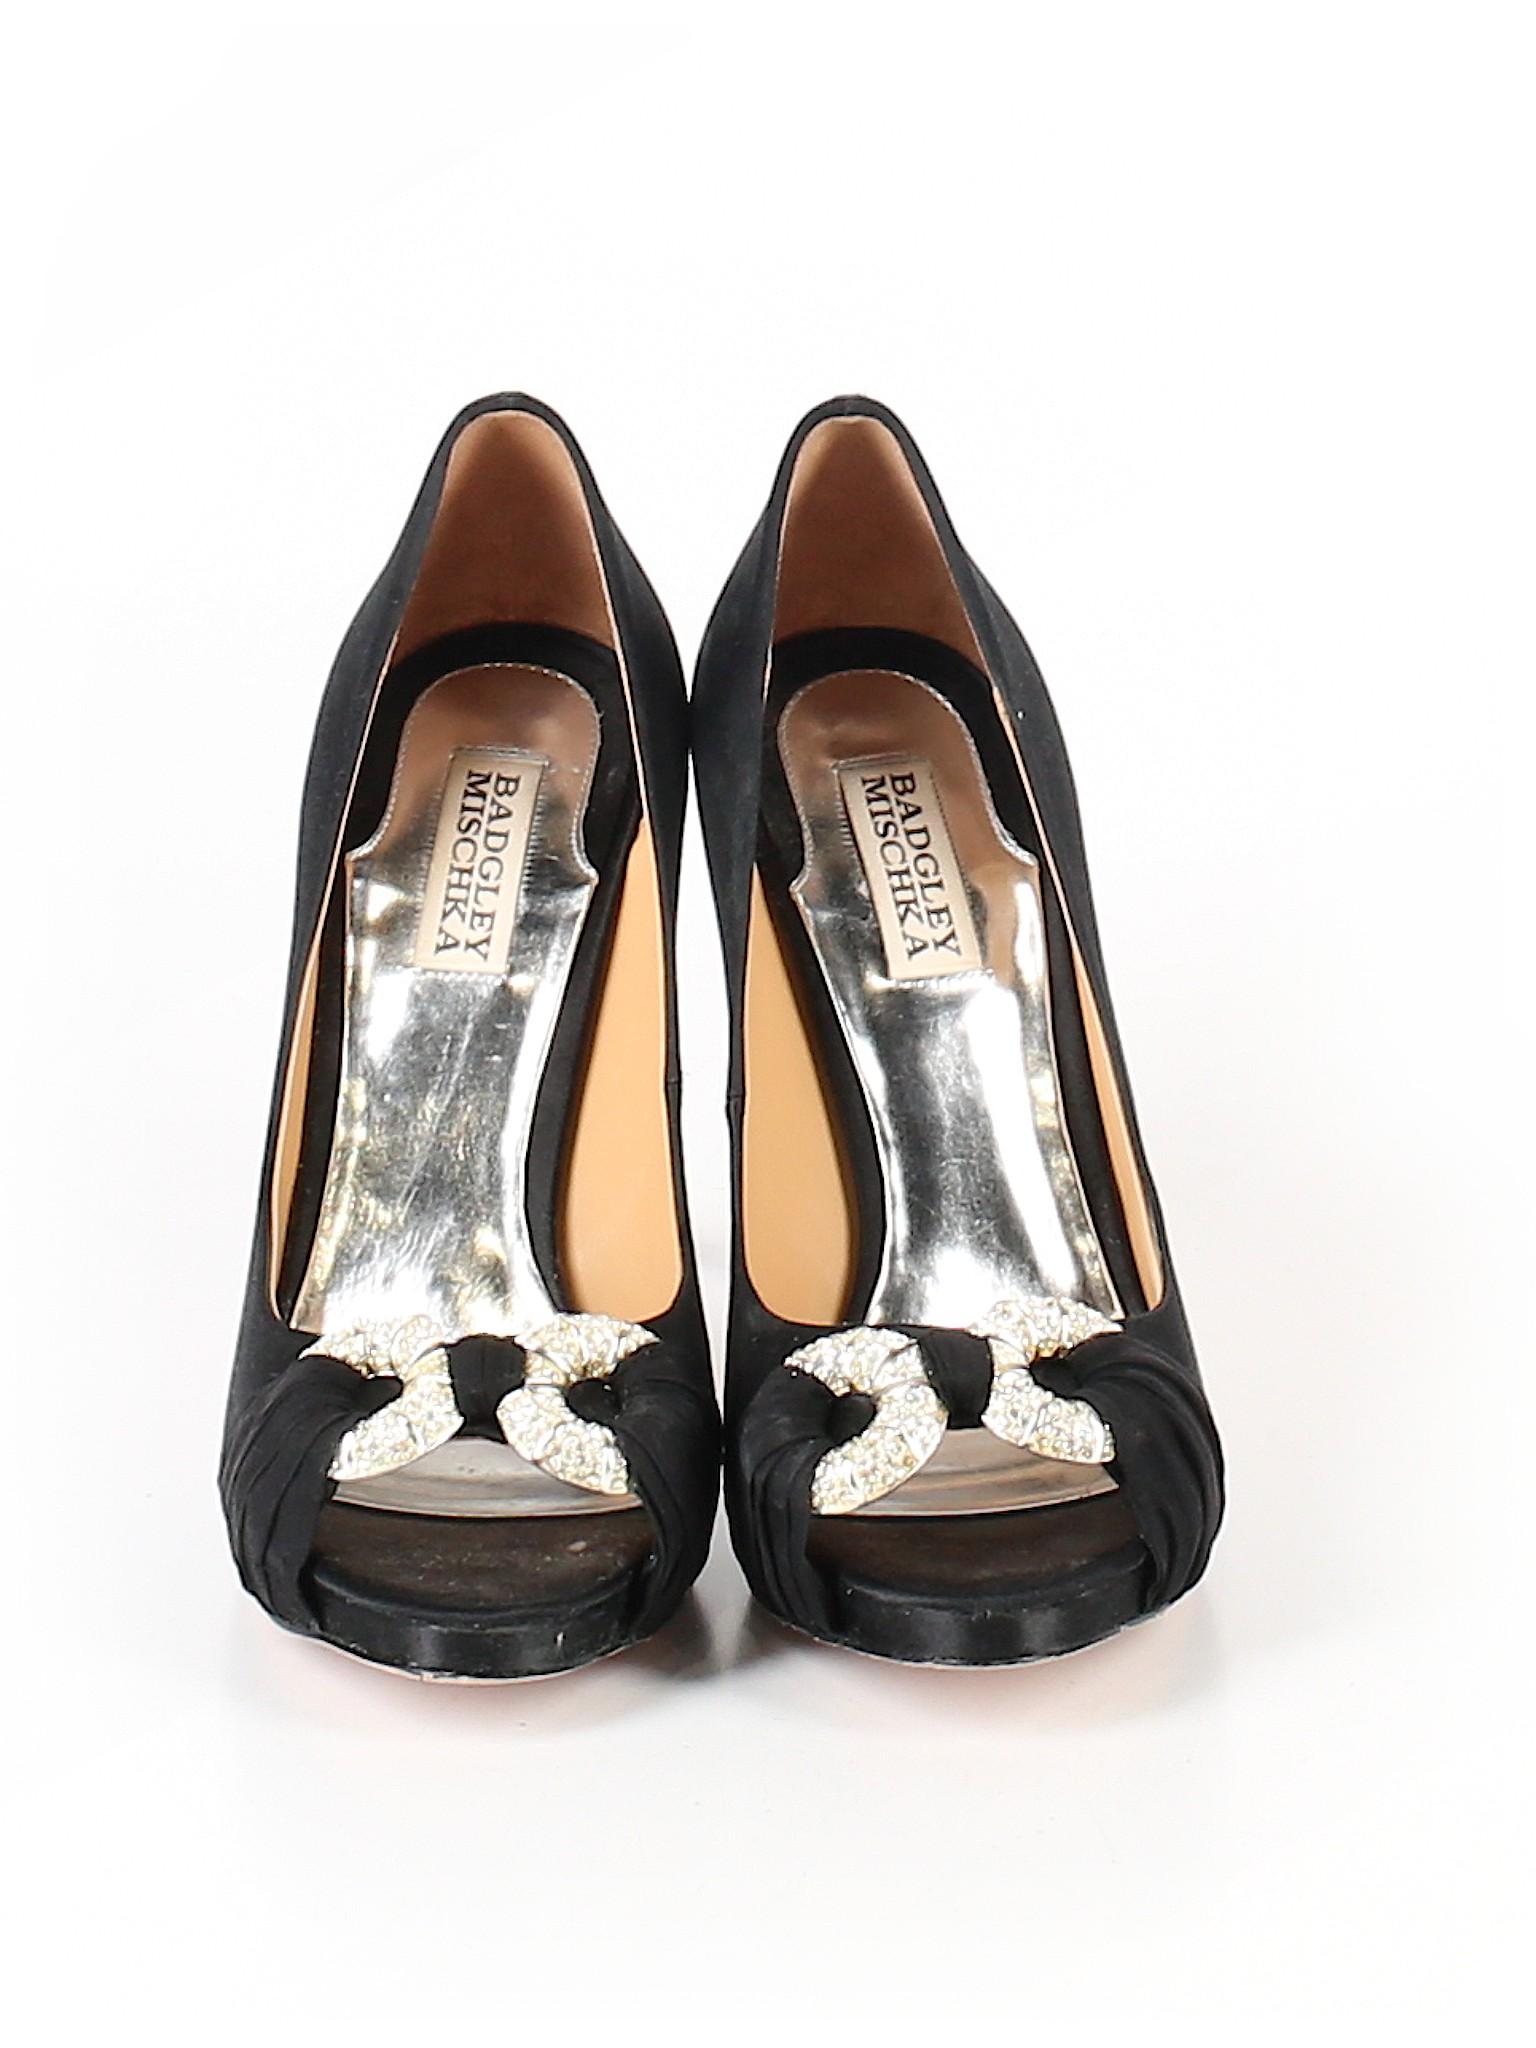 Boutique promotion Boutique Badgley Mischka Mischka promotion Heels Mischka Badgley Boutique promotion Heels Badgley rRrq8w5